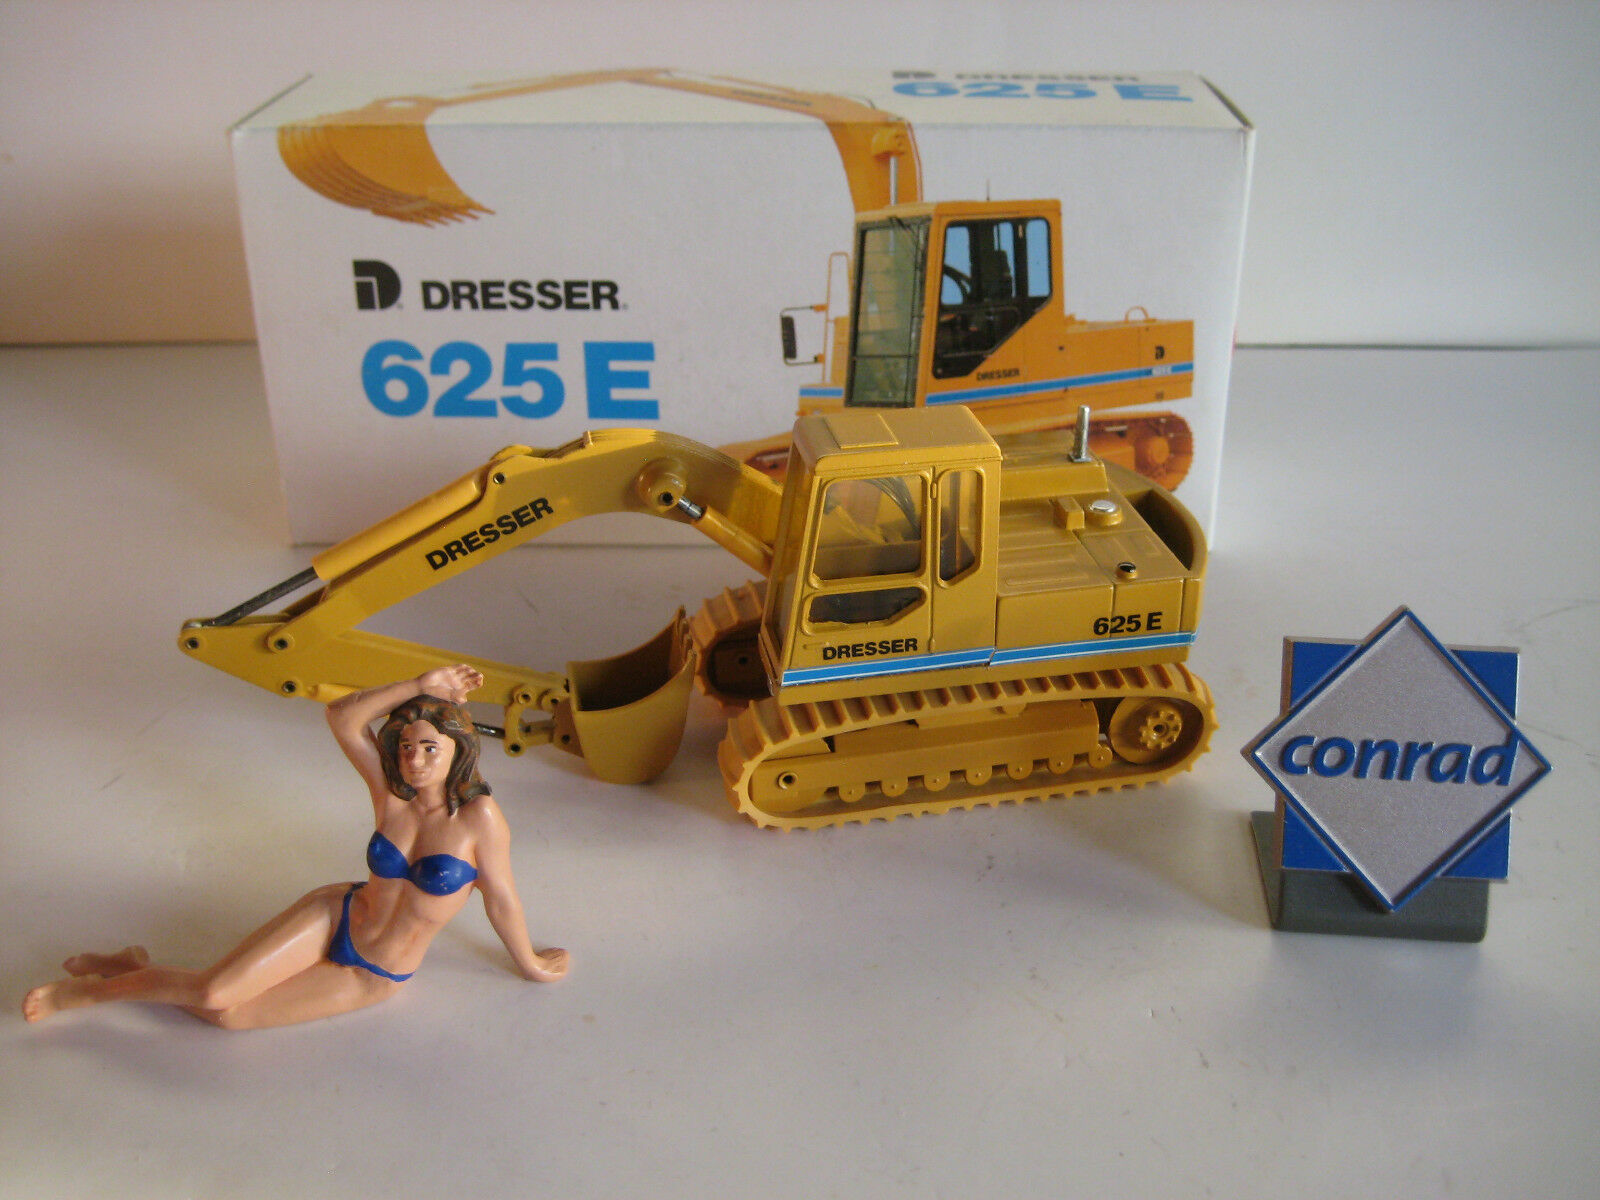 Sideboard 625 e excavator chains Caterpillar  2819.1 Conrad 1 50 EMB. orig